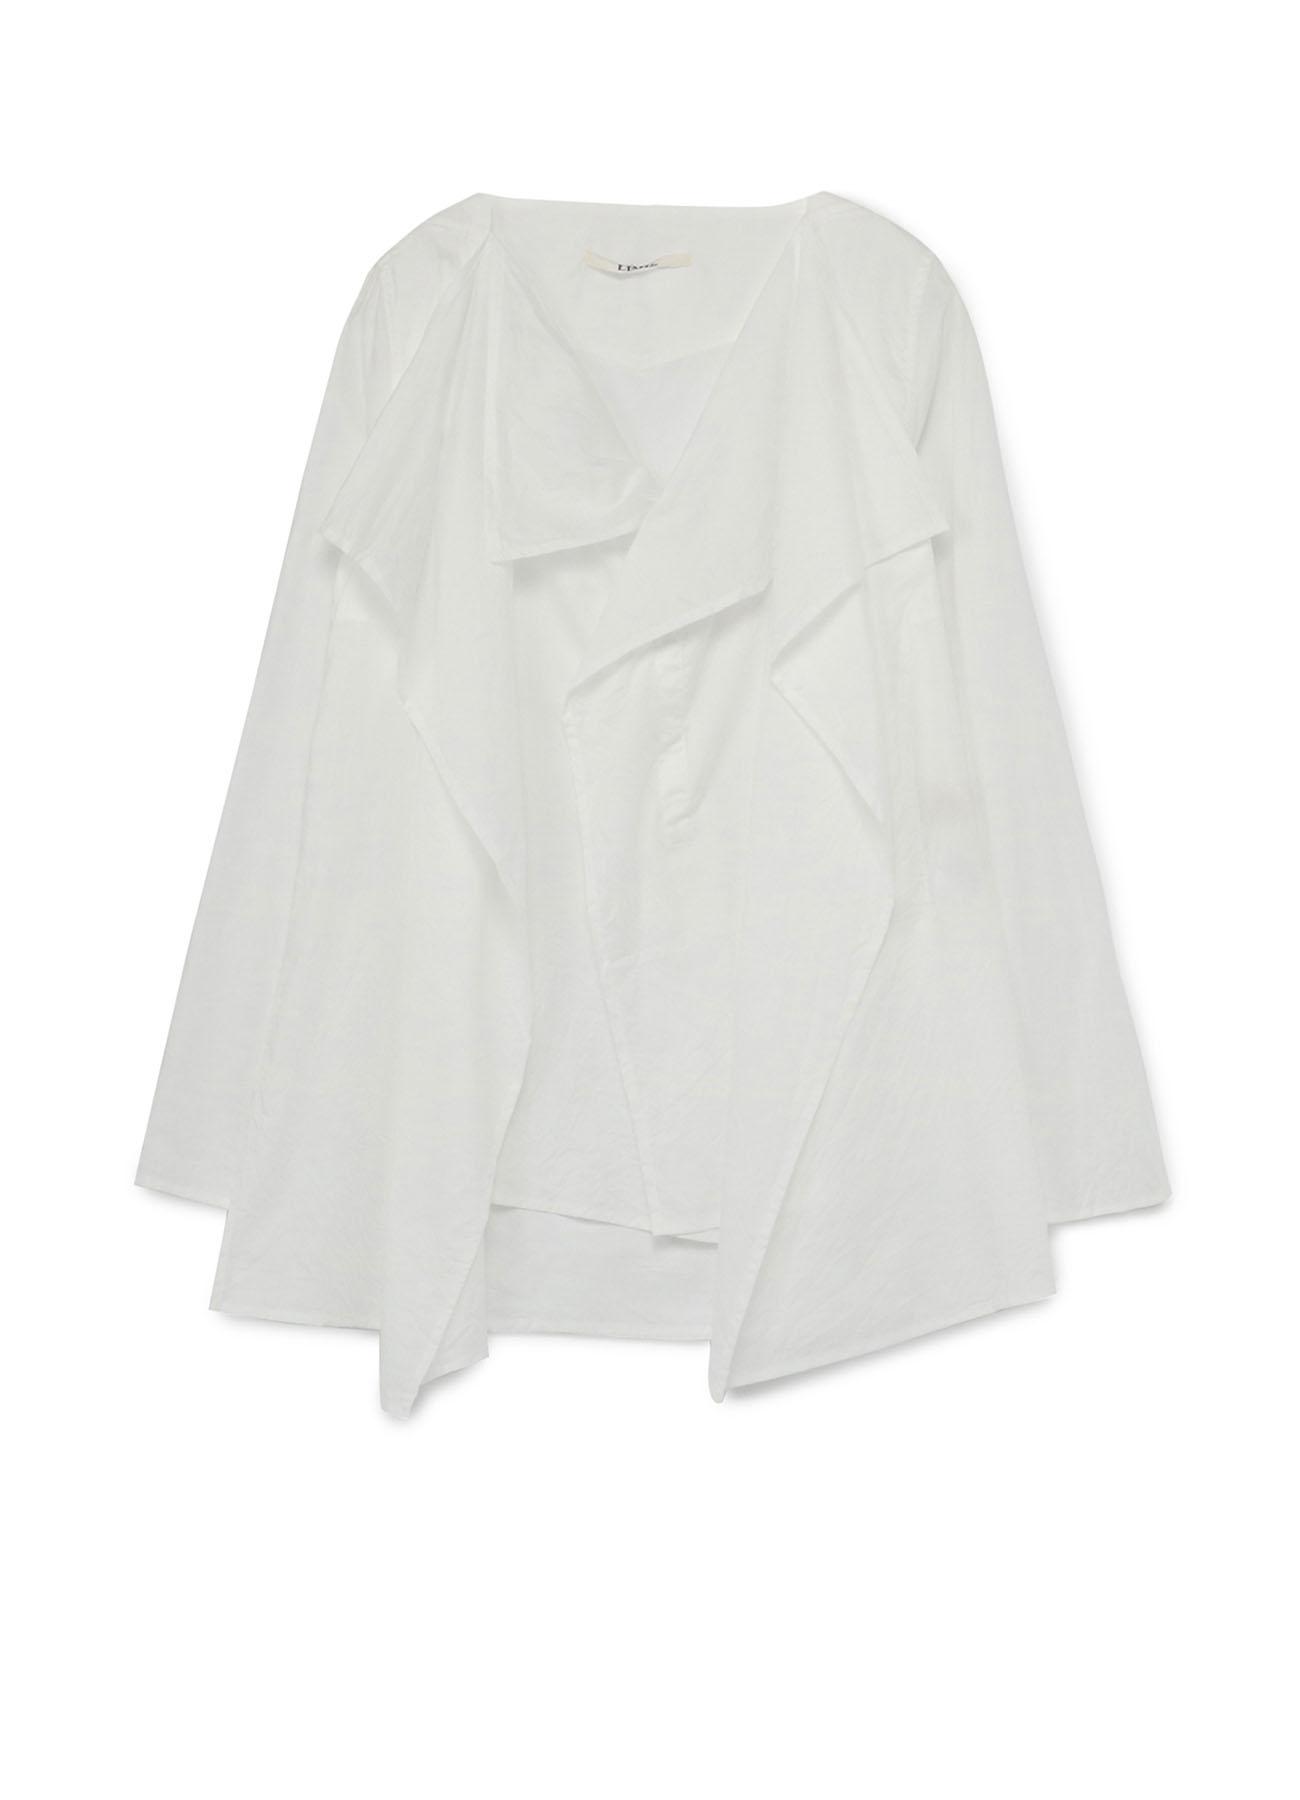 Compact Viyella Flont Layered Shirt